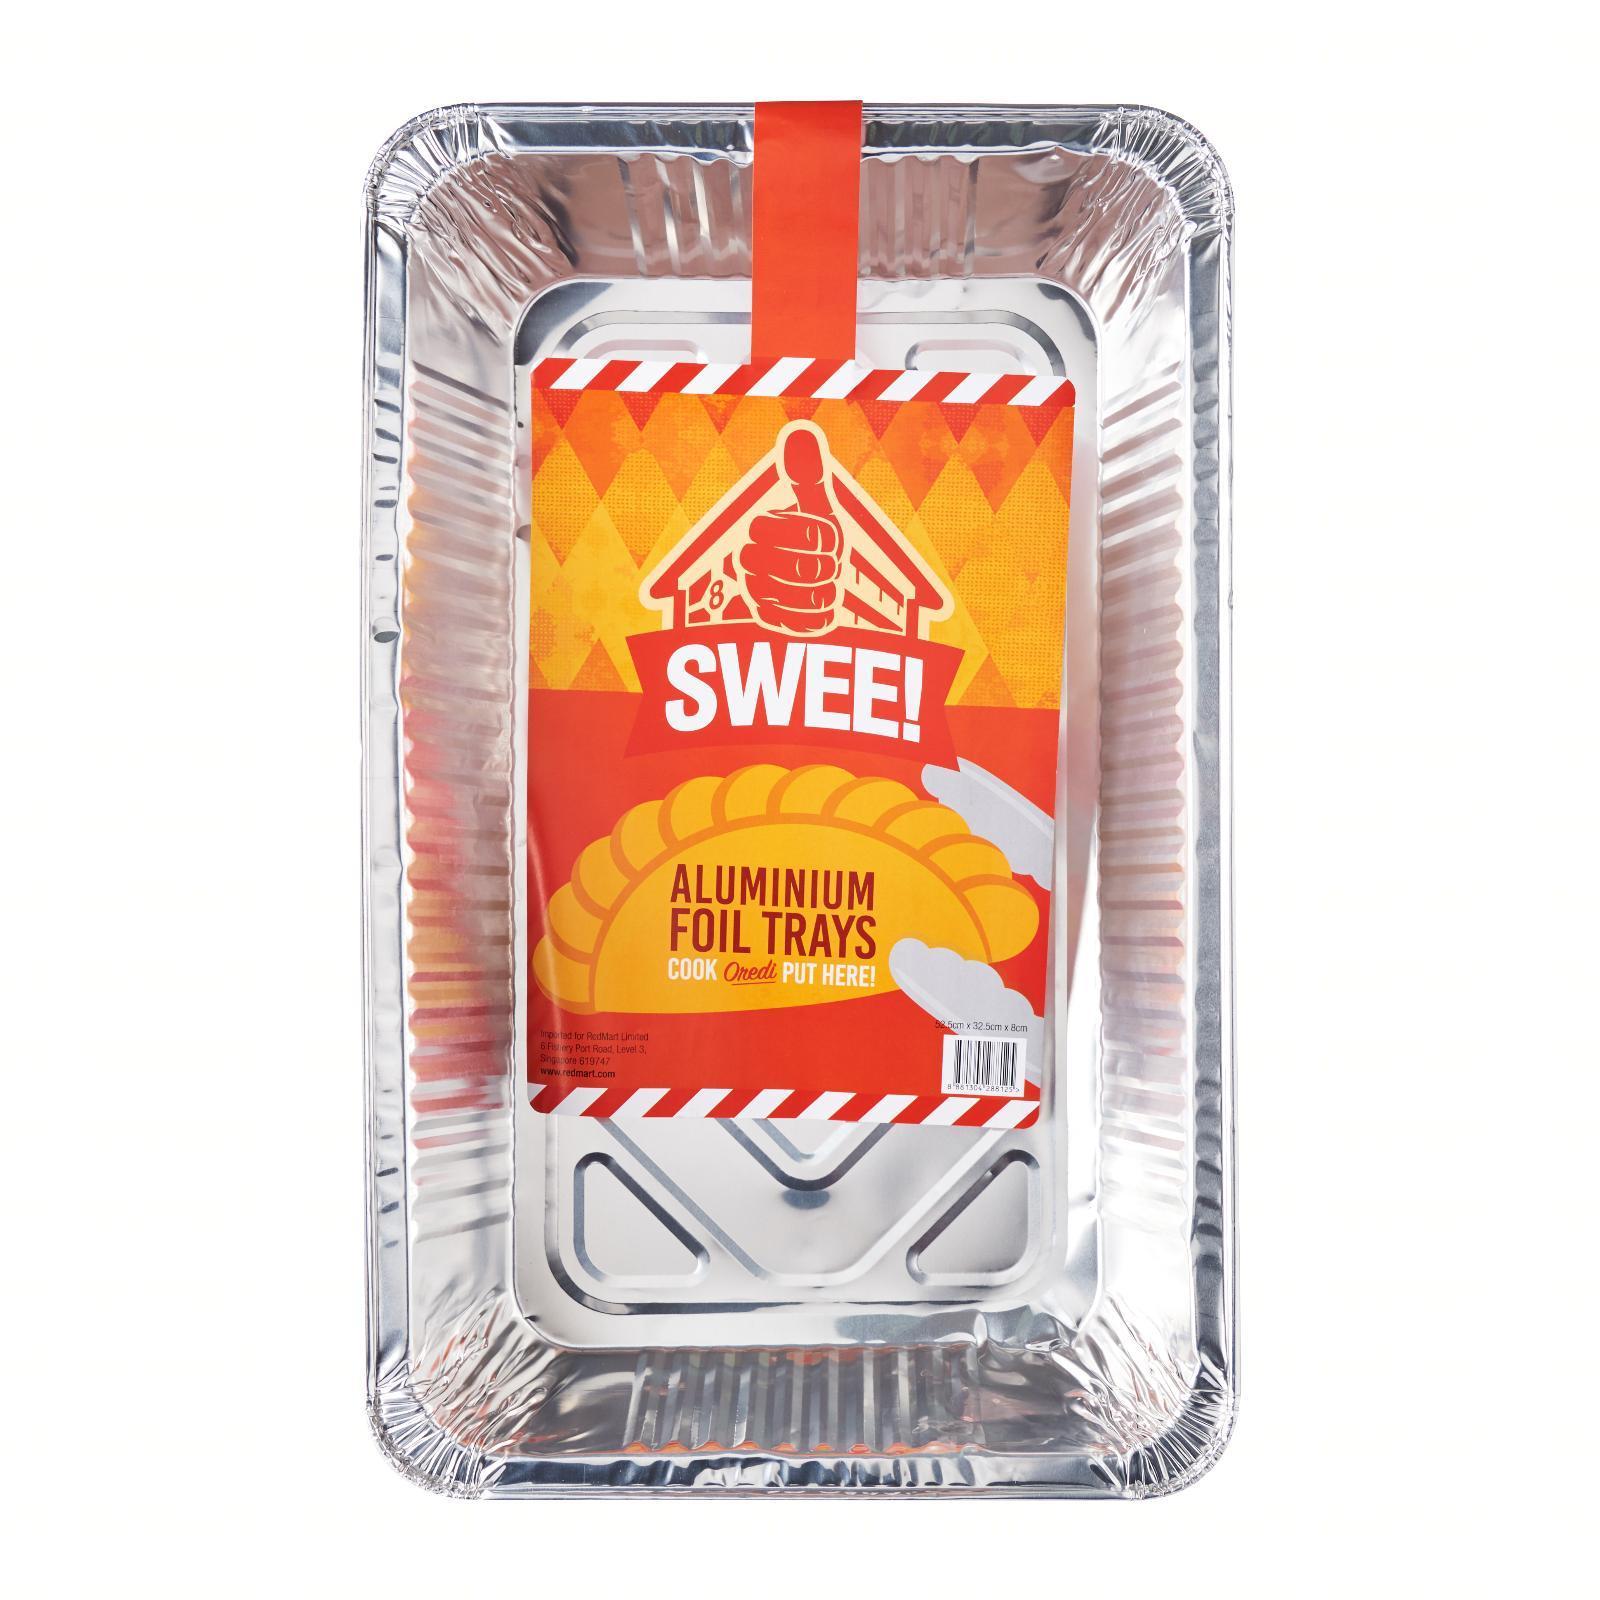 Swee! Aluminium Foil Tray (Large) - 52.5CM X 32.5CM